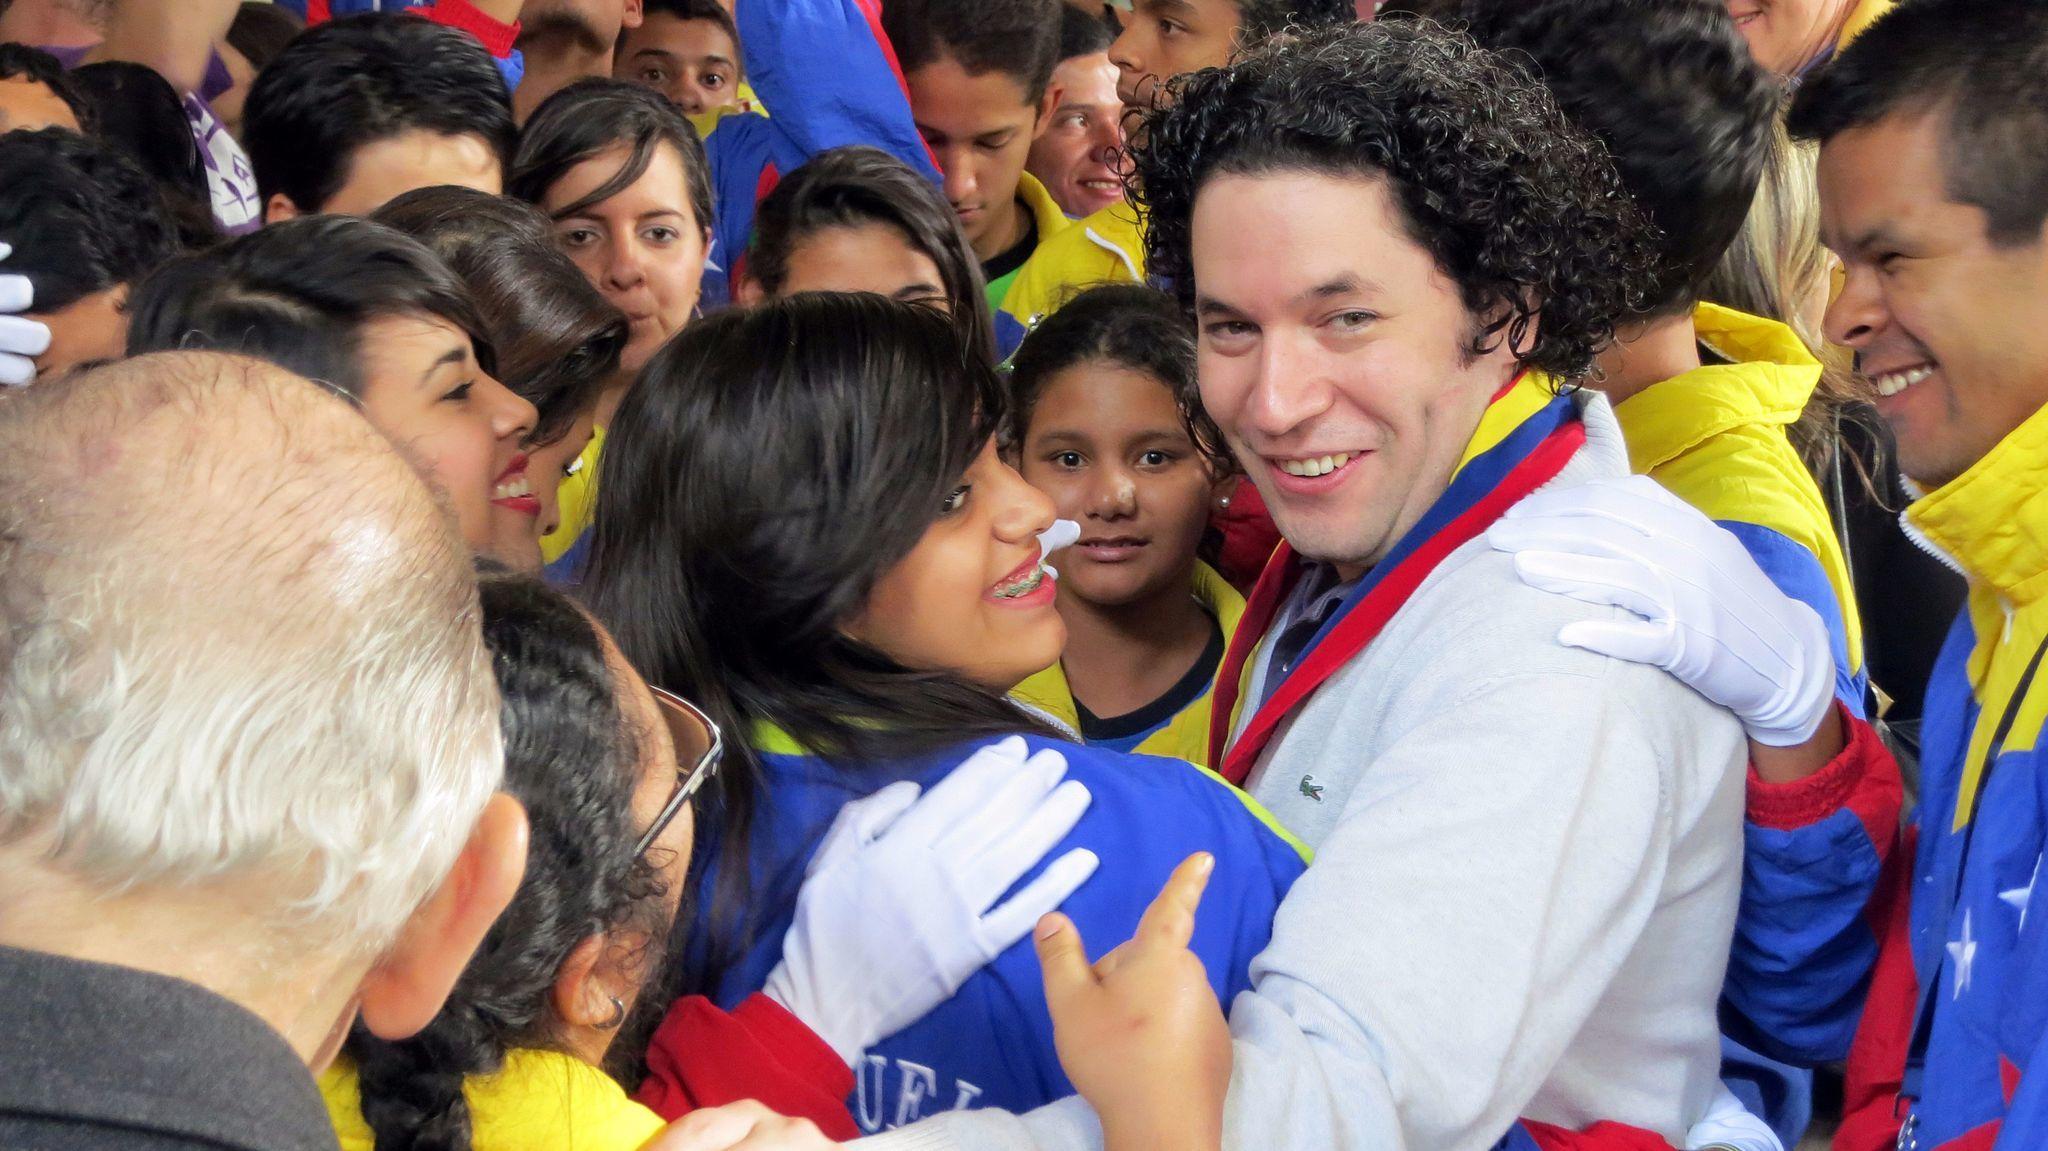 Gustavo Dudamel among students at a 2012 showcase performance of El Sistema students in Caracas, Venezuela. (Mark Swed / Los Angeles Times)